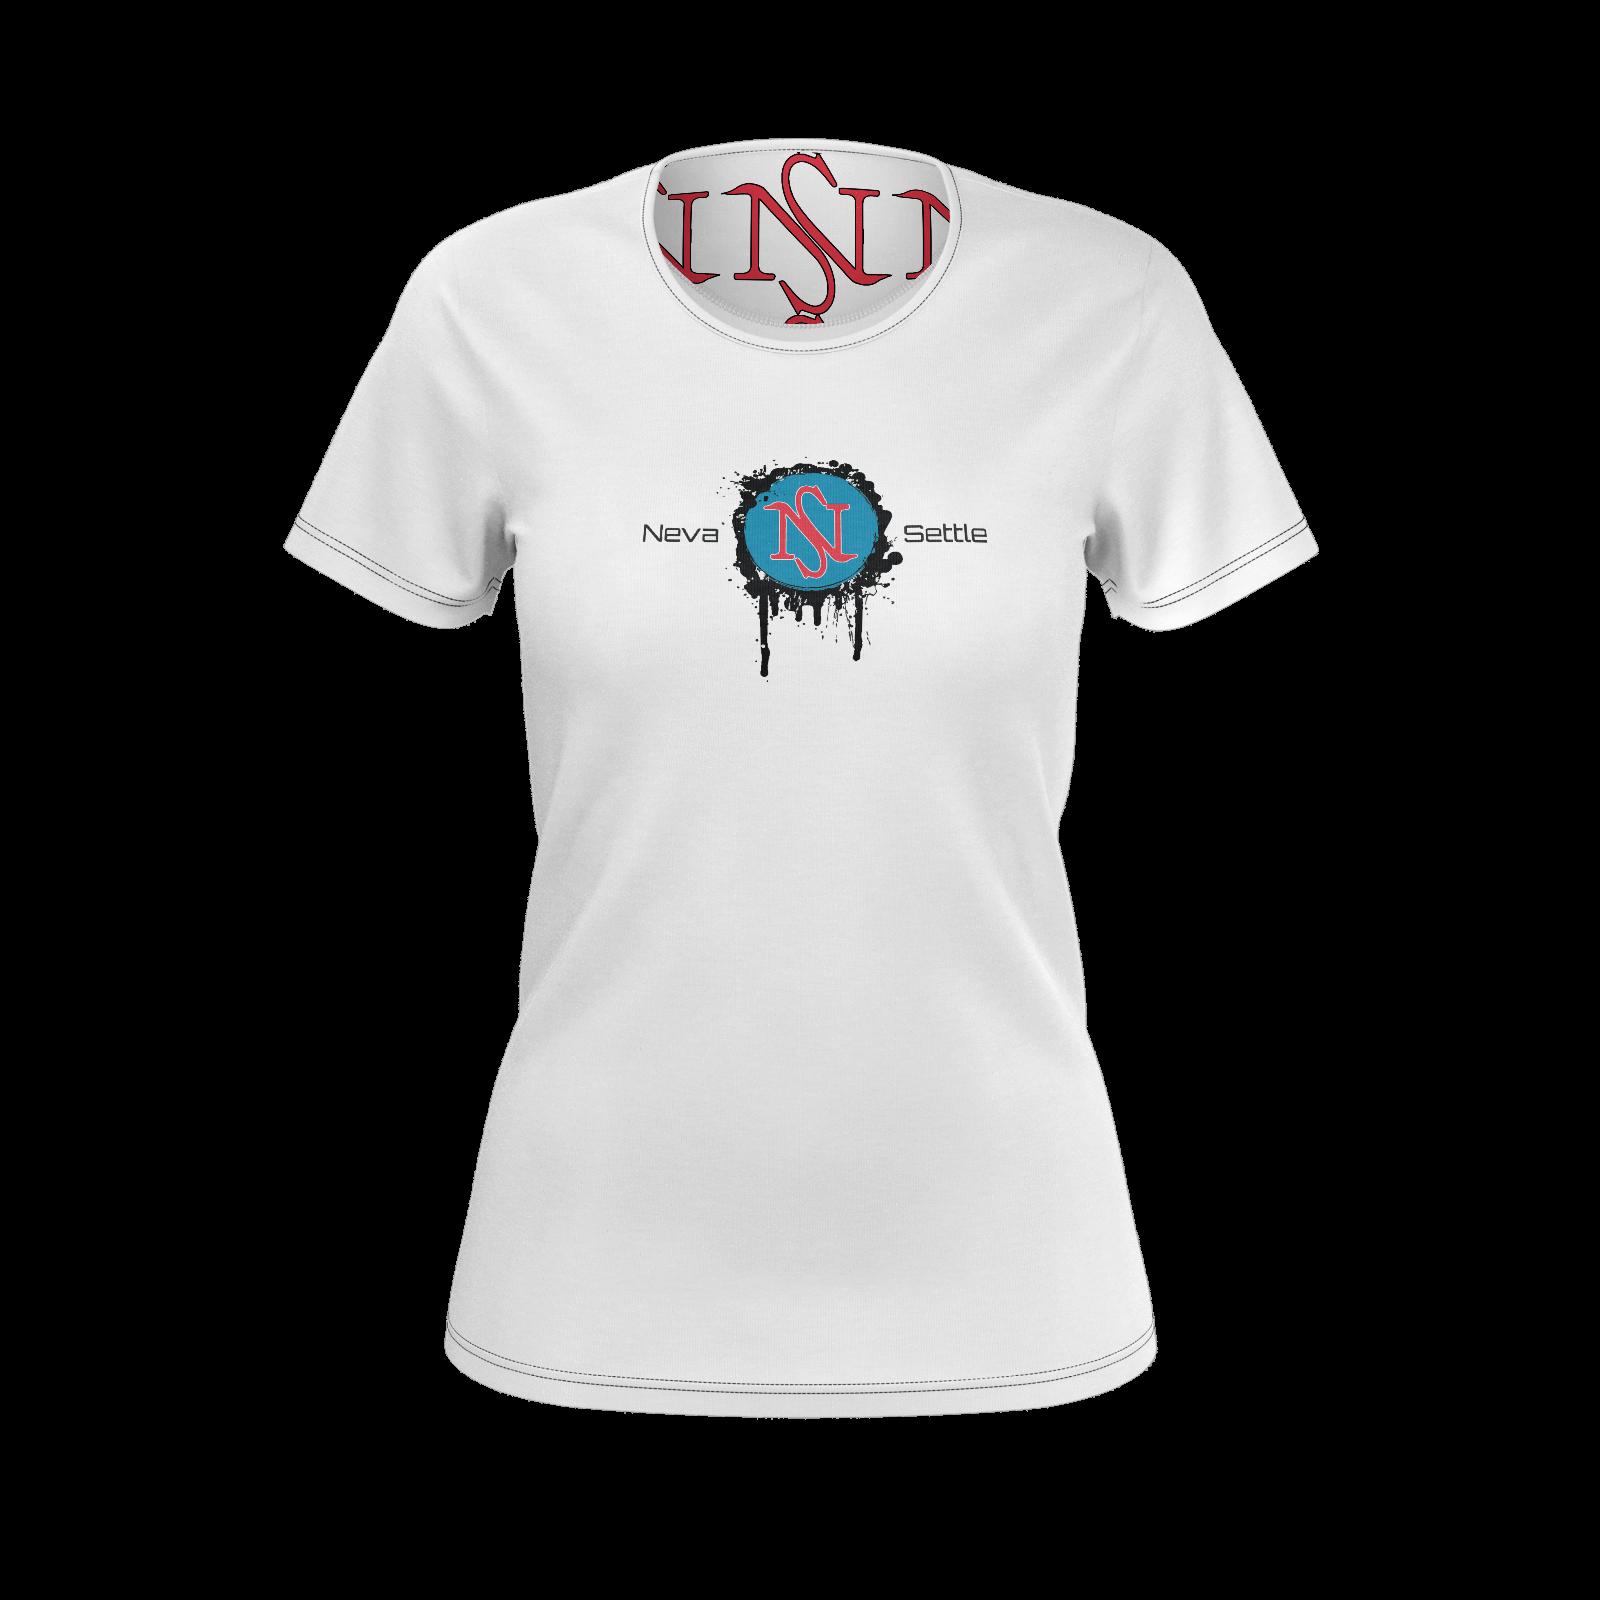 NS Neva Settle Logo Ink Spot Ladies Pima Tshirt (matching